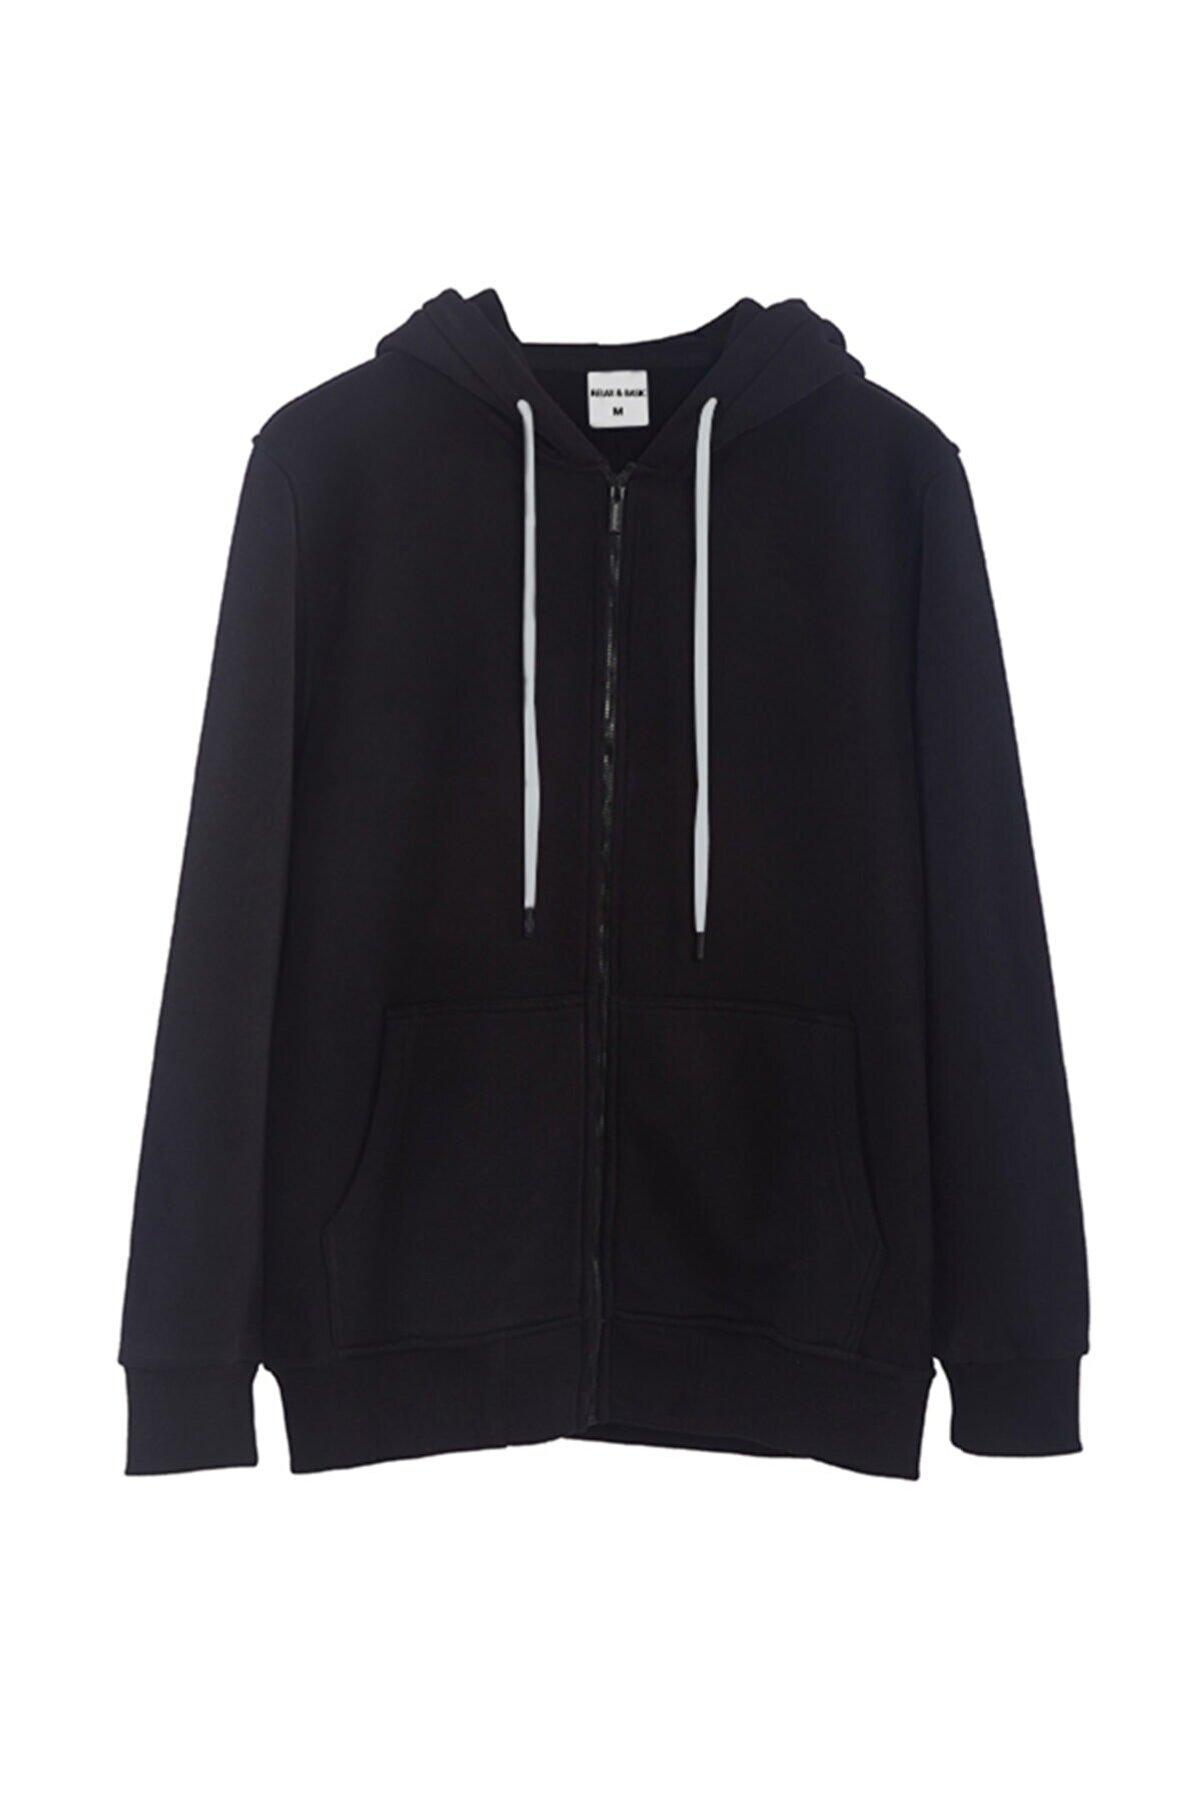 Relax&Basic Siyah Kapüşonlu Fermuarlı Sweatshirt